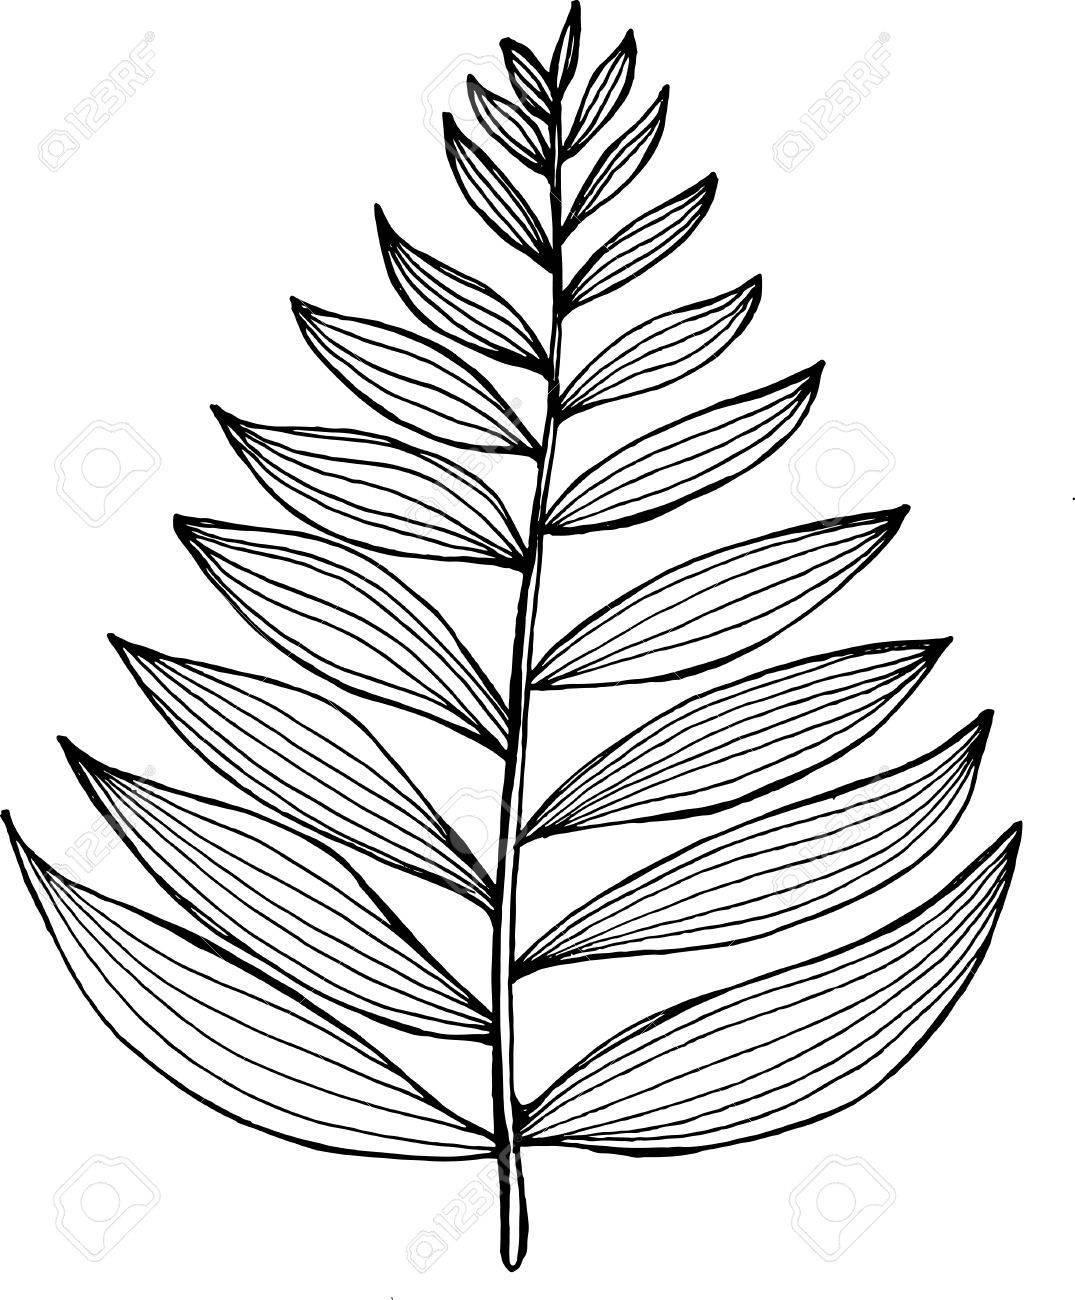 Black and white fractal clipart svg transparent stock Black and white picture of a fractal leaf. Branch of a fern ... svg transparent stock